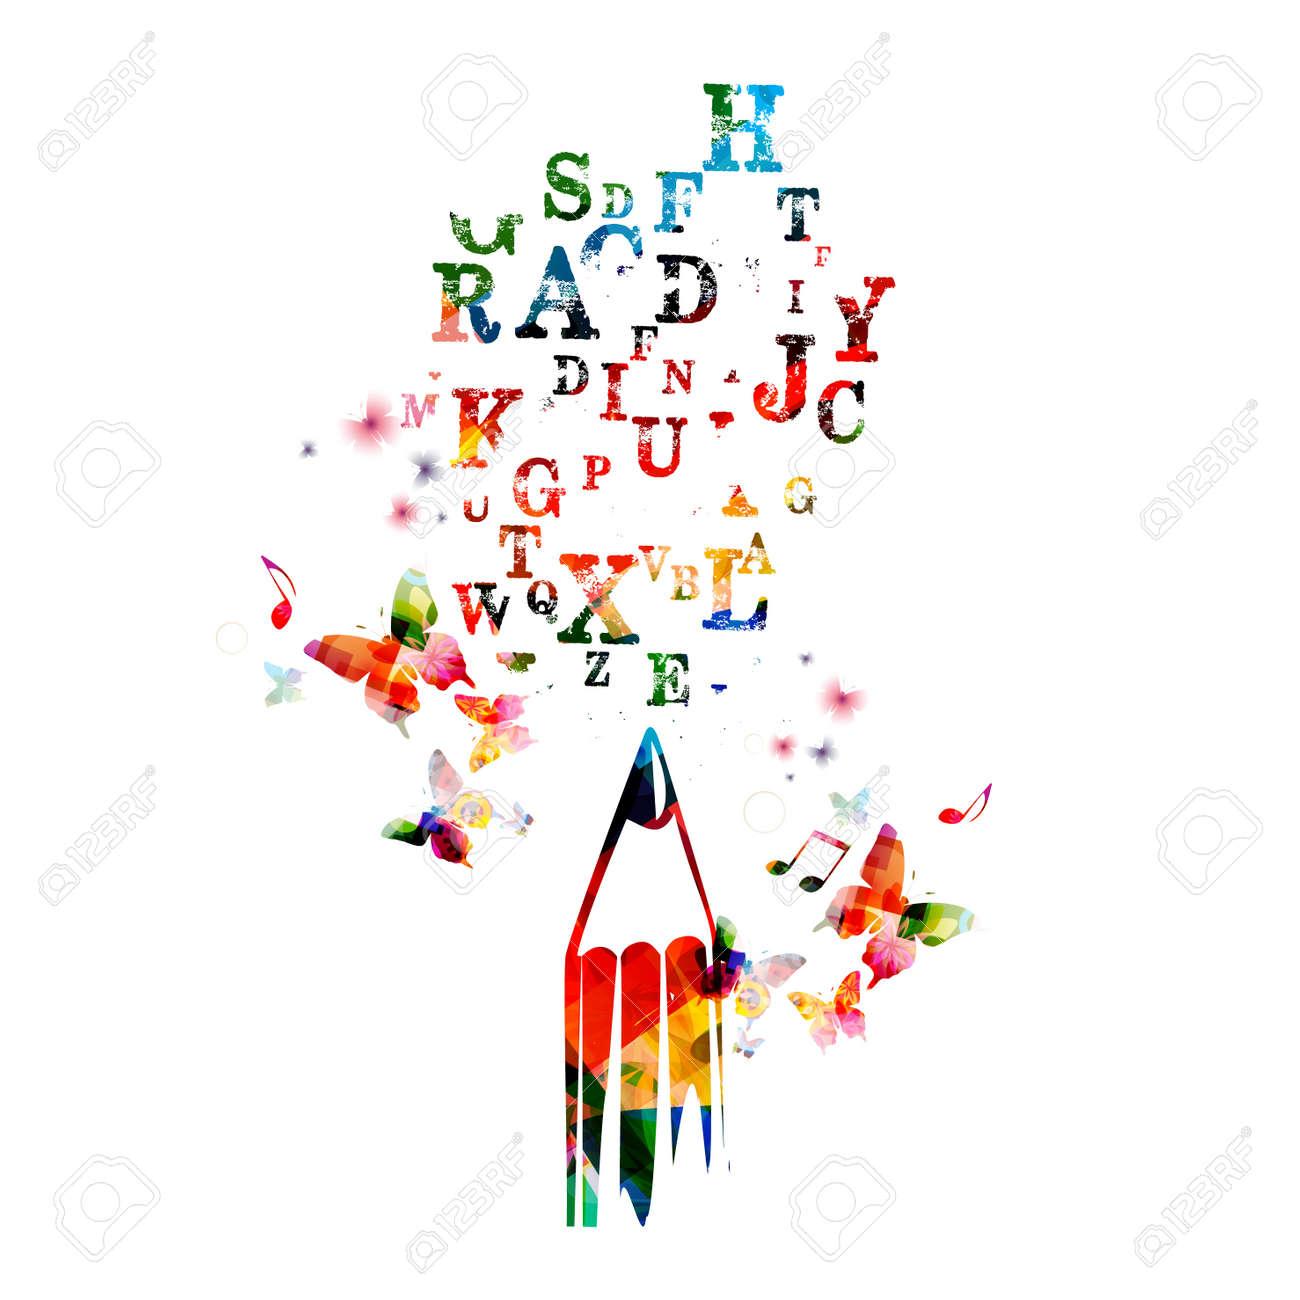 Creative writing concept - 39099097